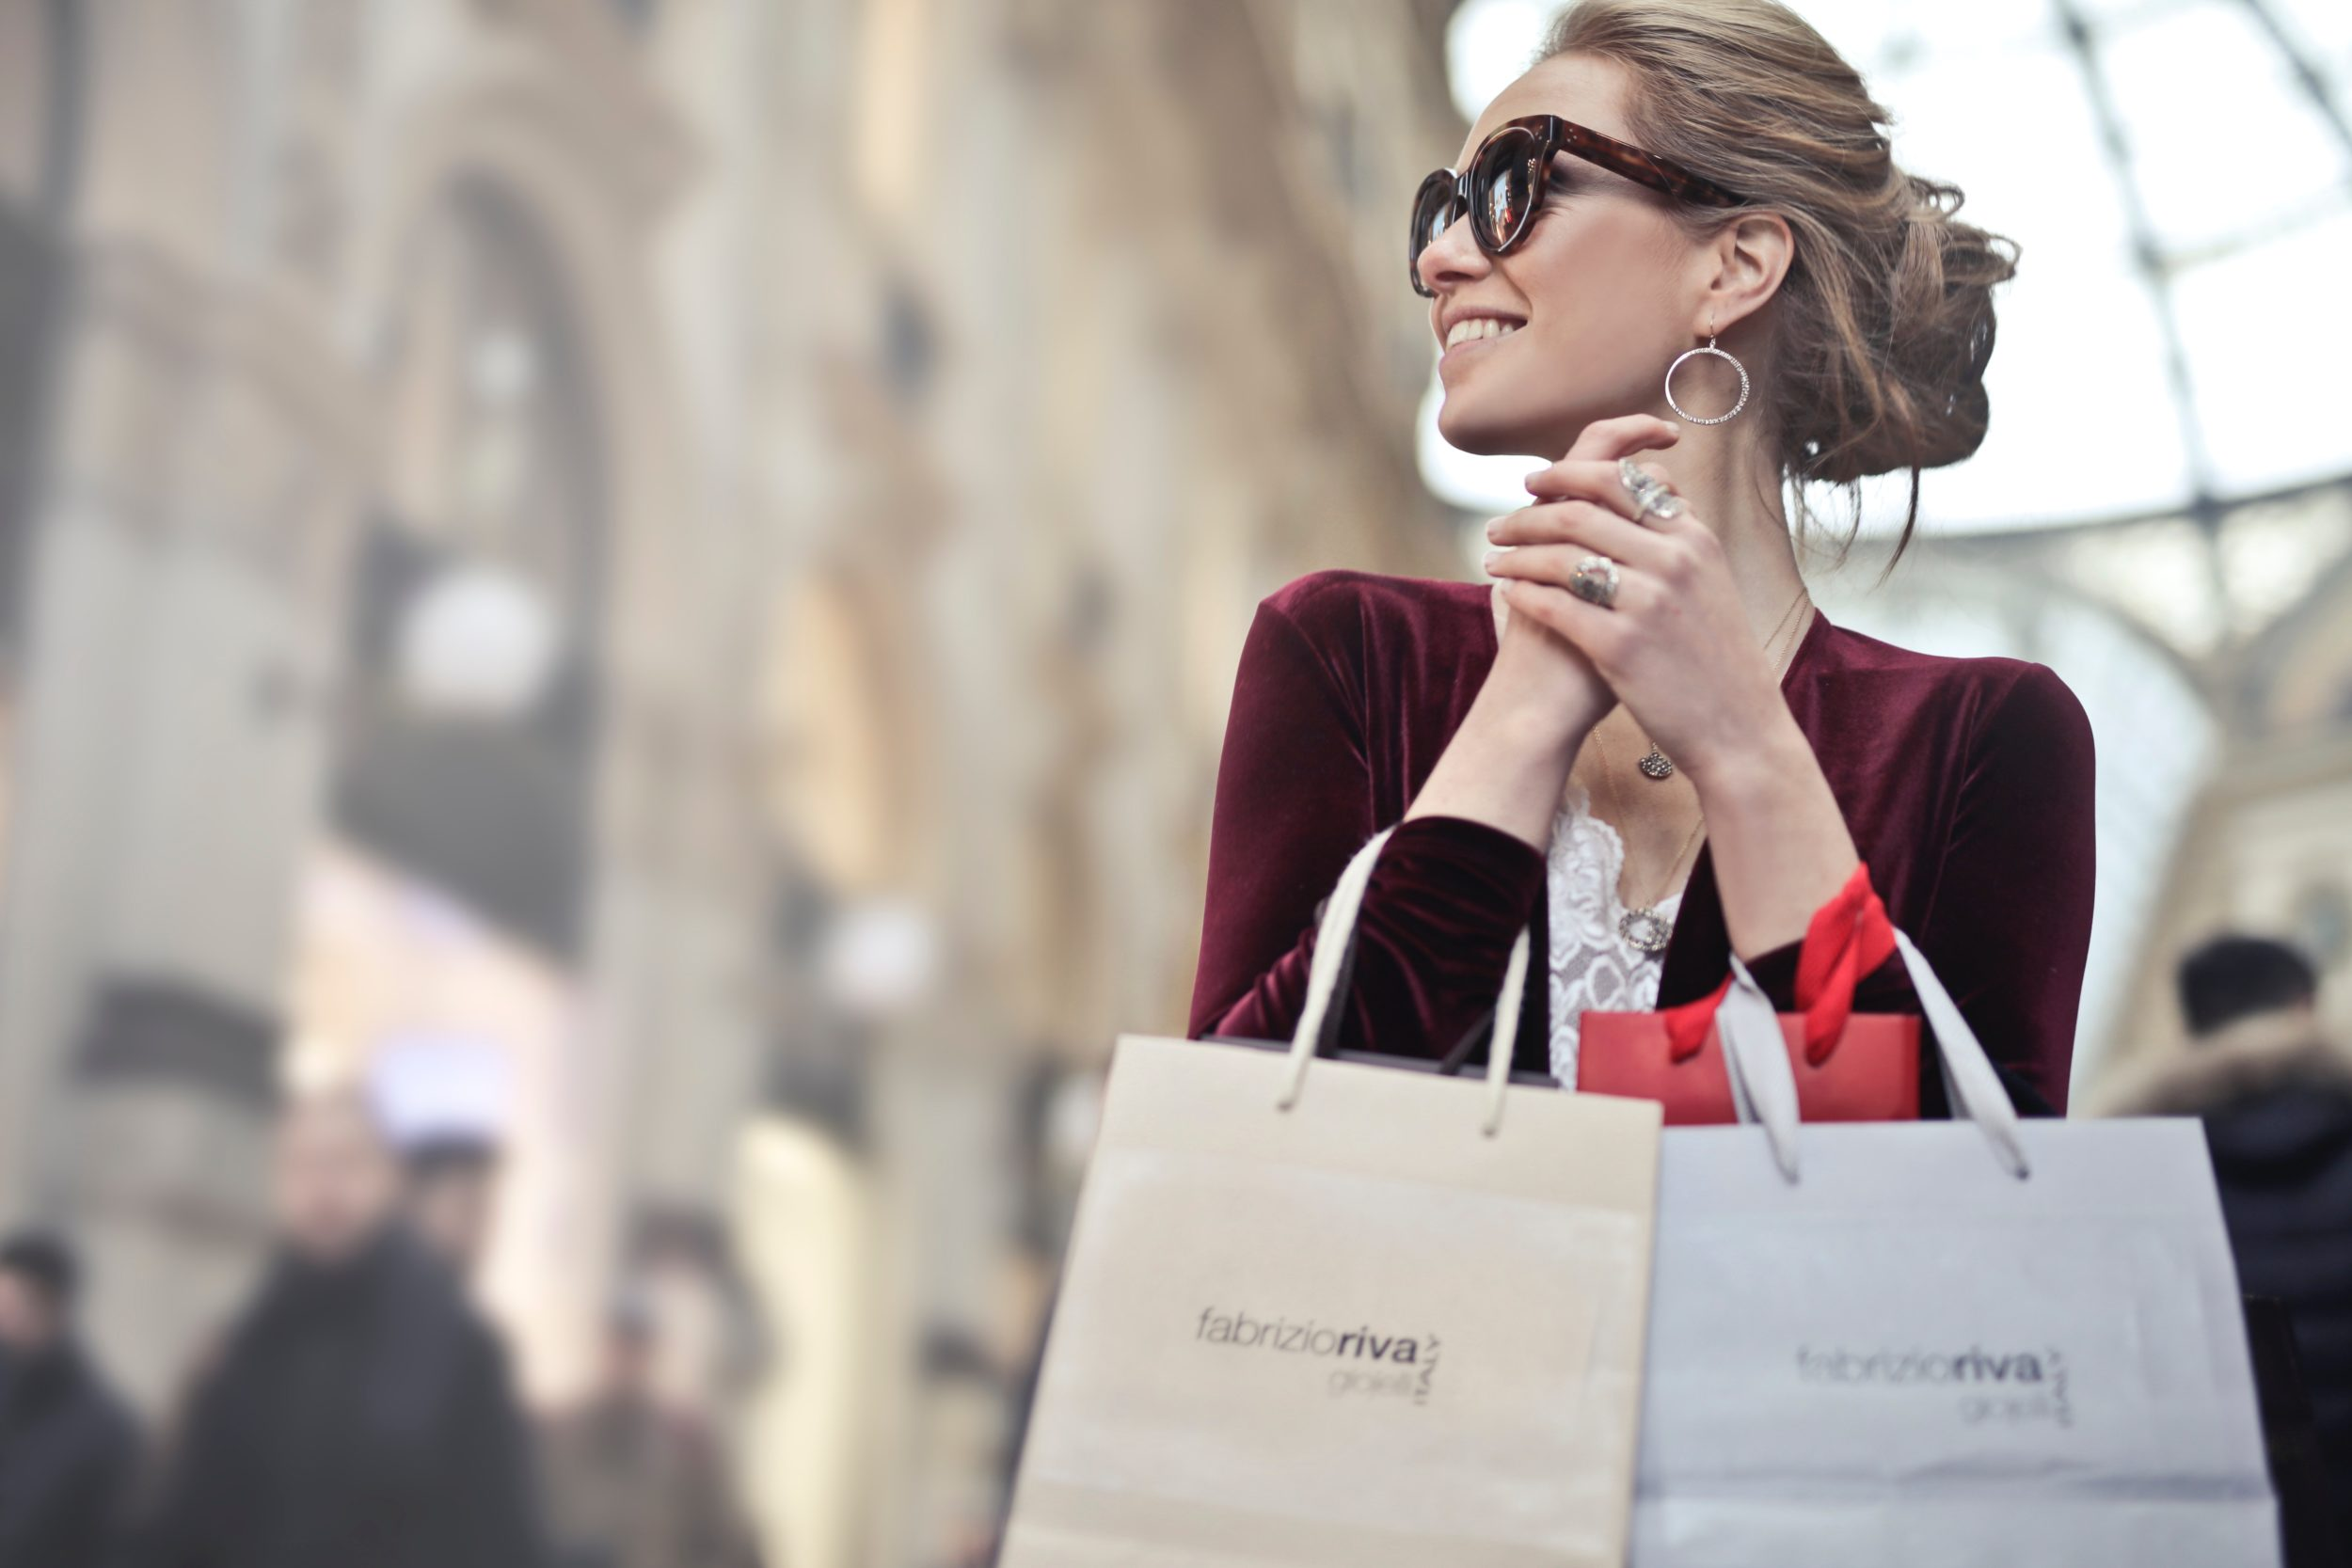 Woman-wearing-sunglasses-shopping-instagram-marketing-strategy